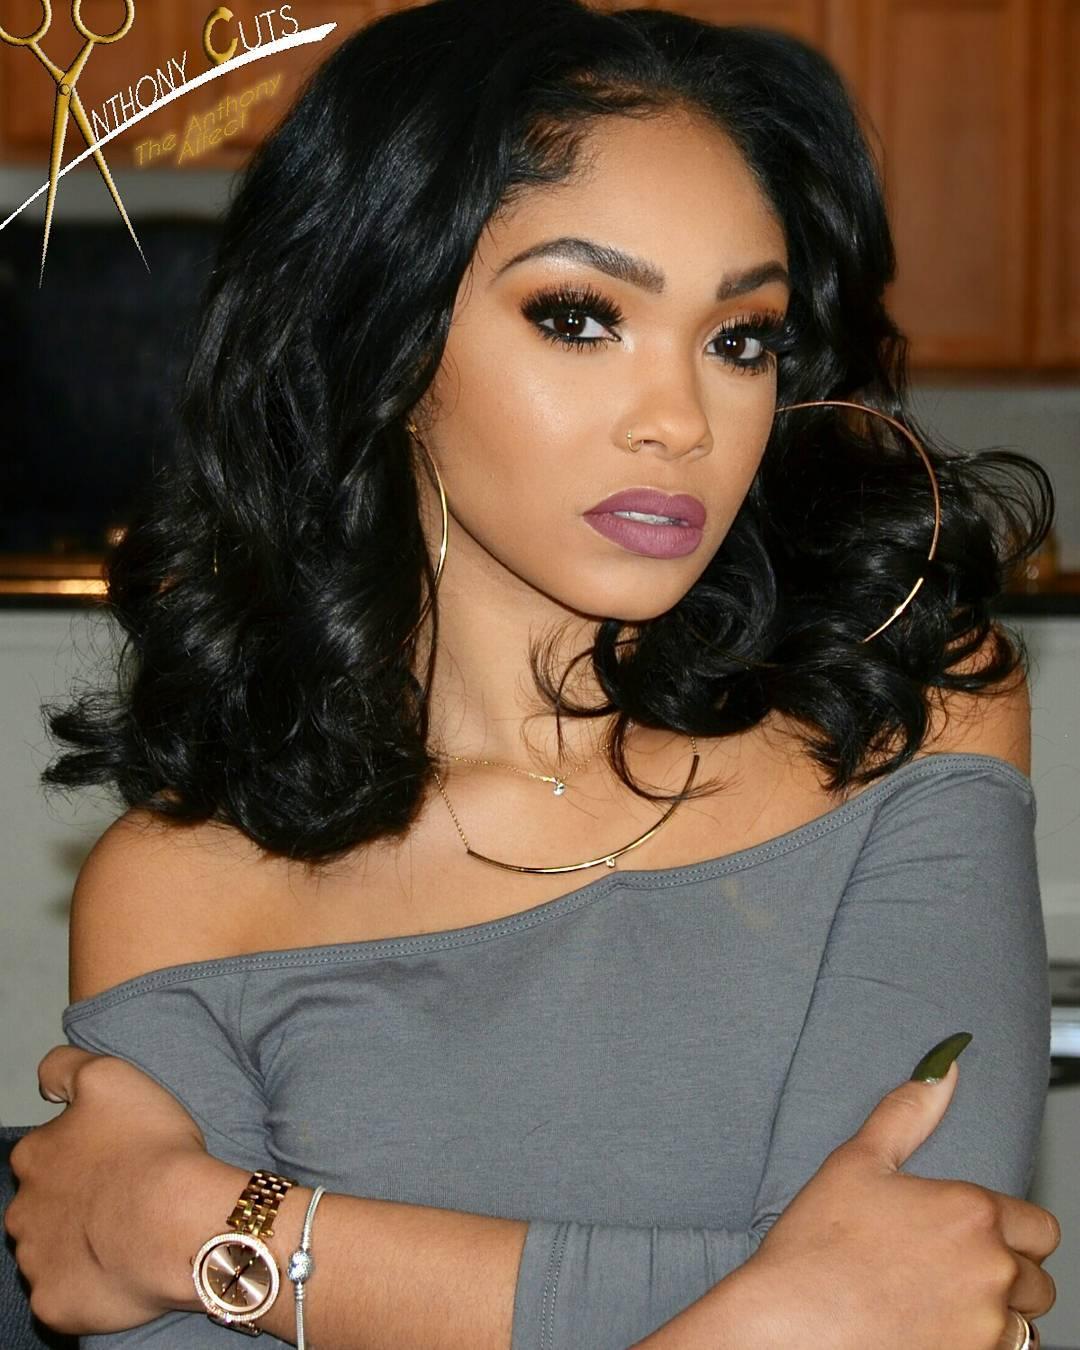 Fantastic 50 Best Eye Catching Long Hairstyles For Black Women Short Hairstyles Gunalazisus